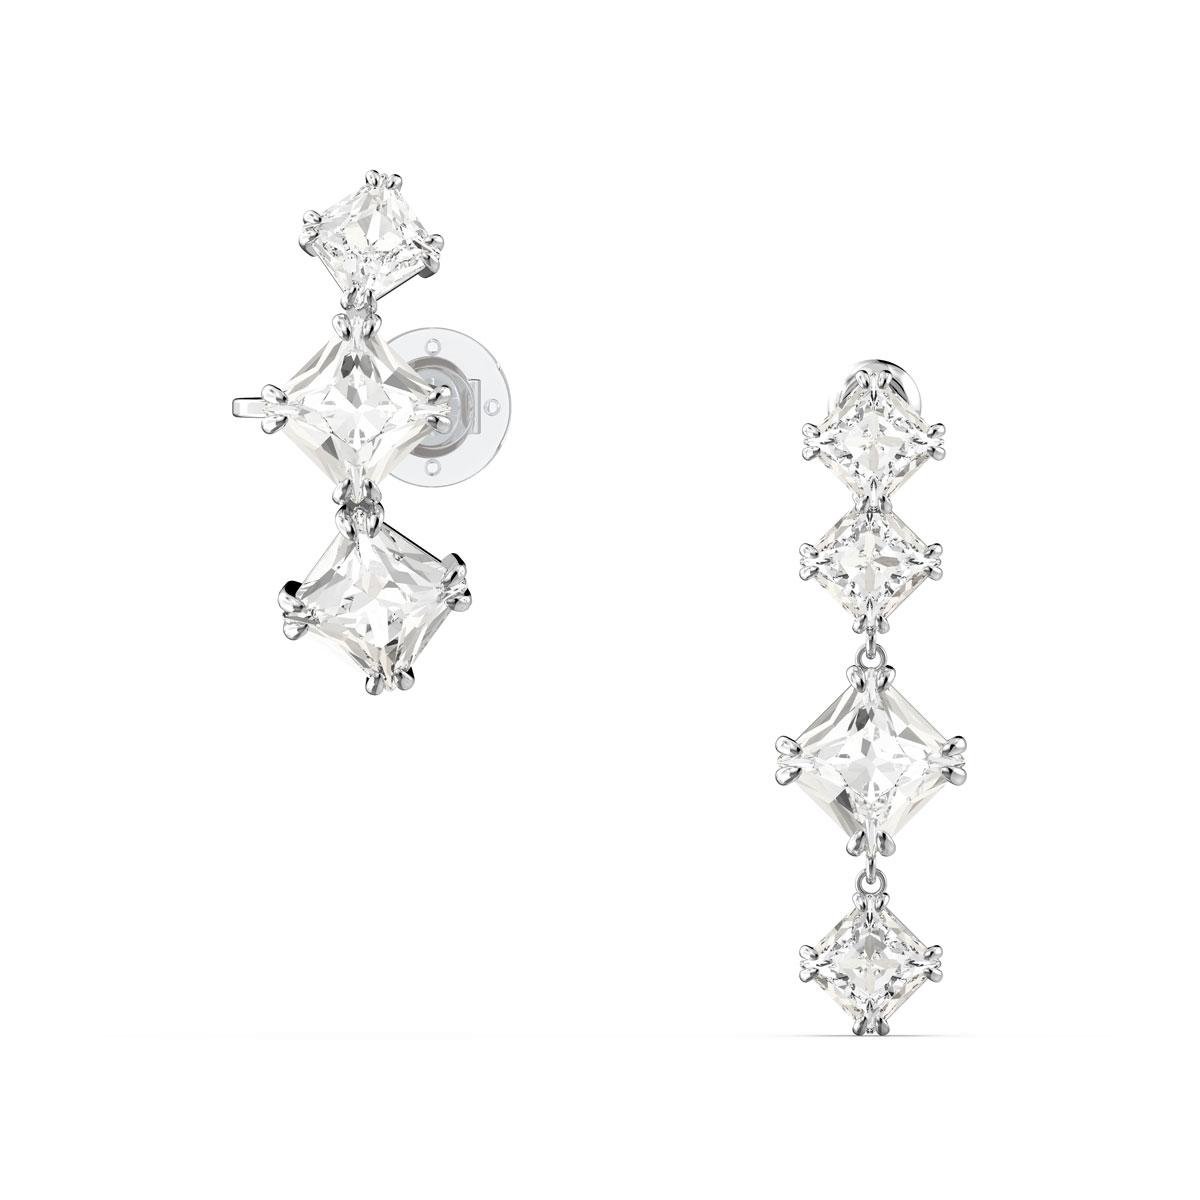 Swarovski Millenia Drop Earrings, Asymmetrical, Set, White, Rhodium Plated, Pair